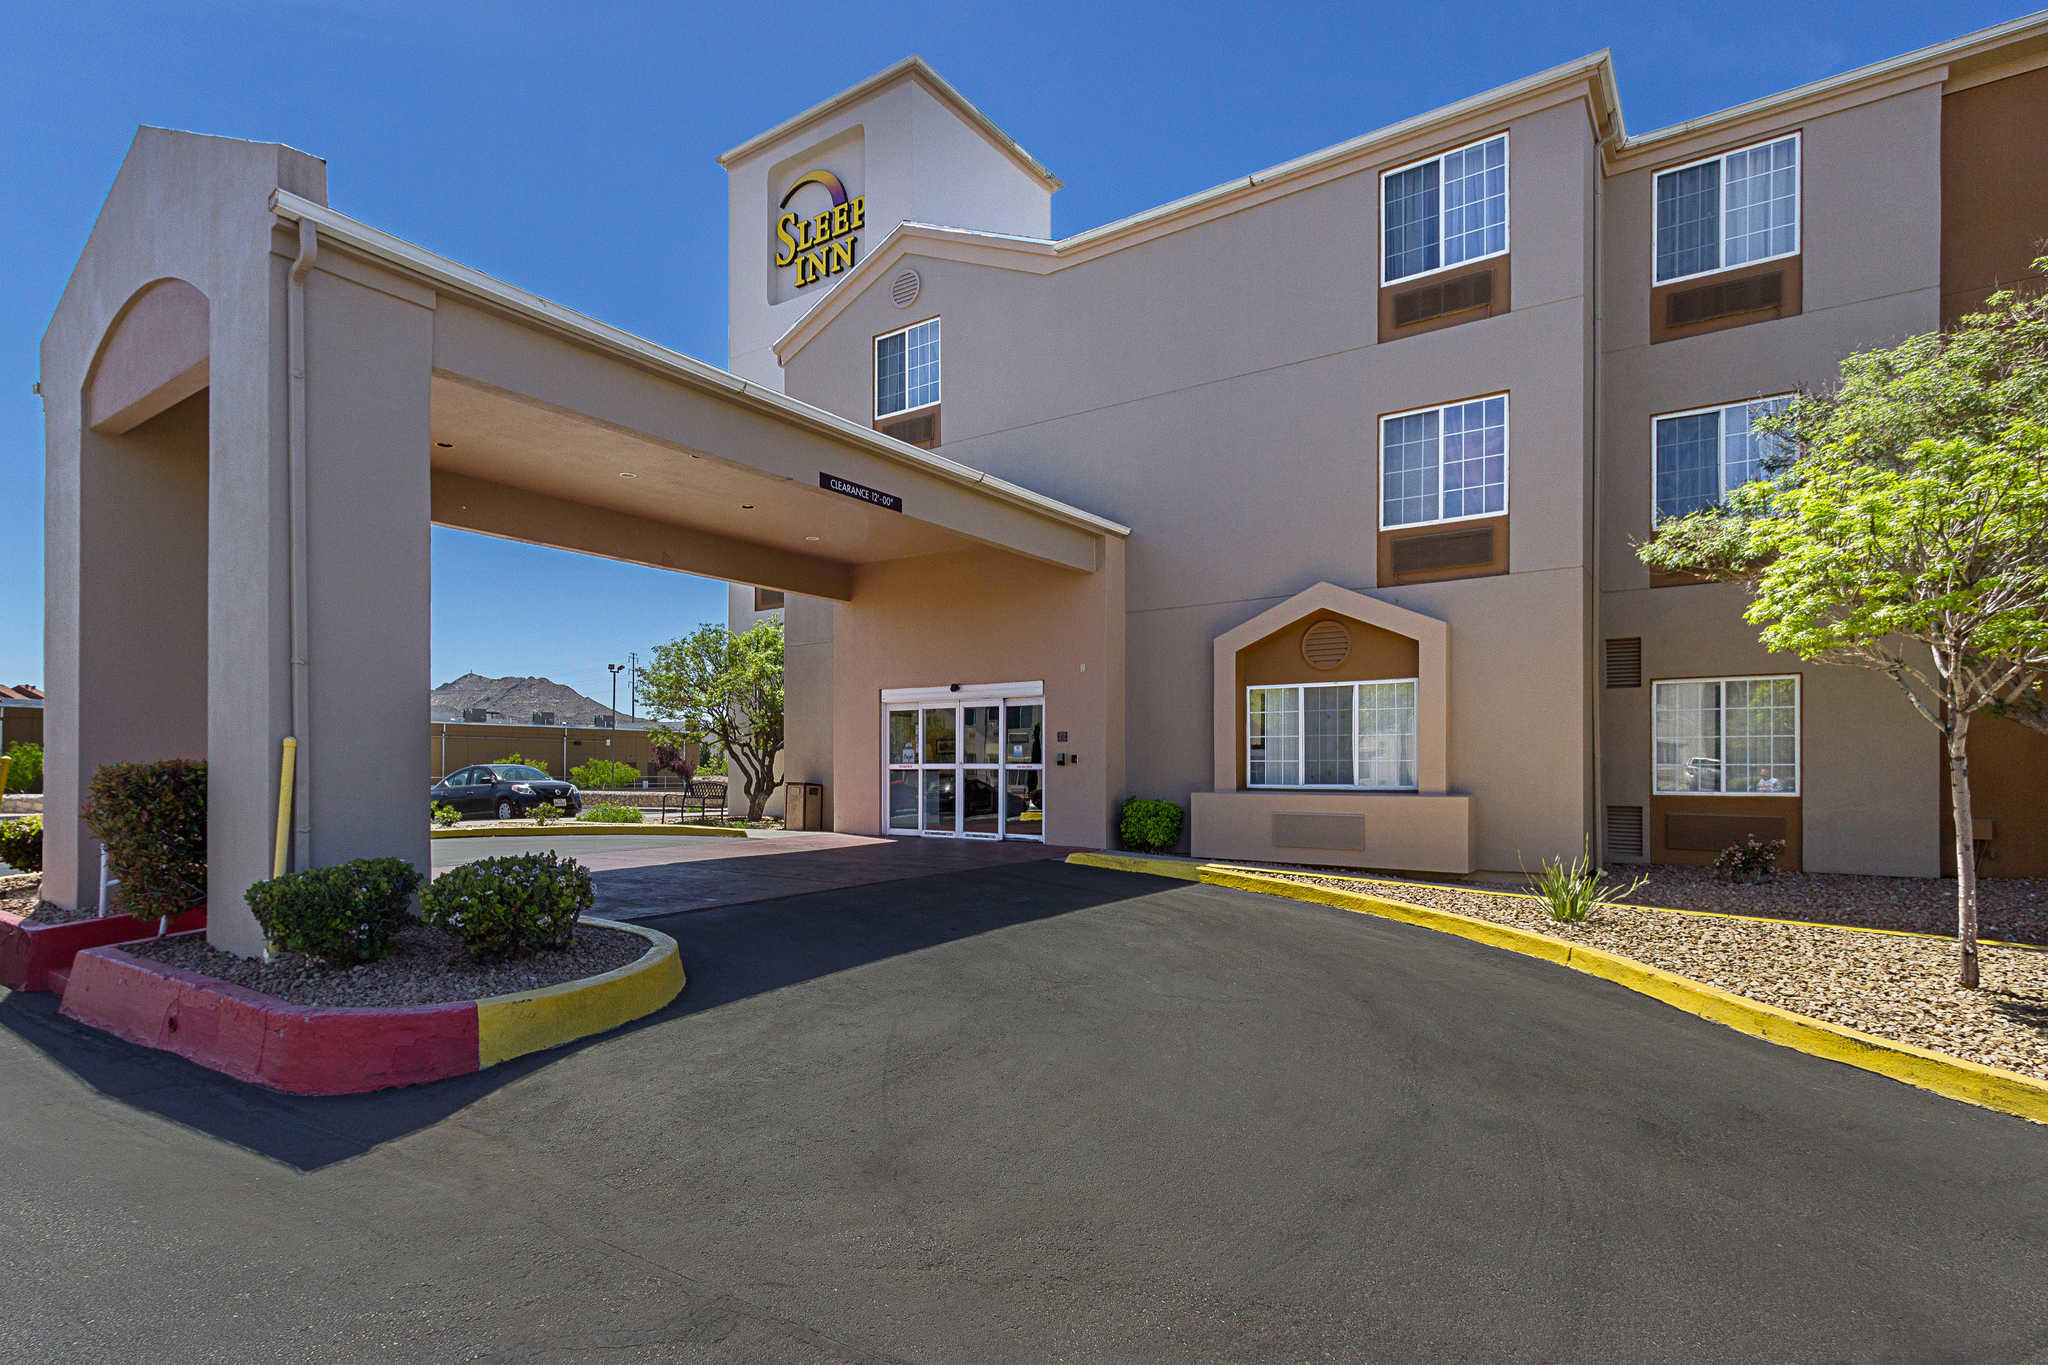 Sleep Inn University Coupons Near Me In El Paso 8coupons